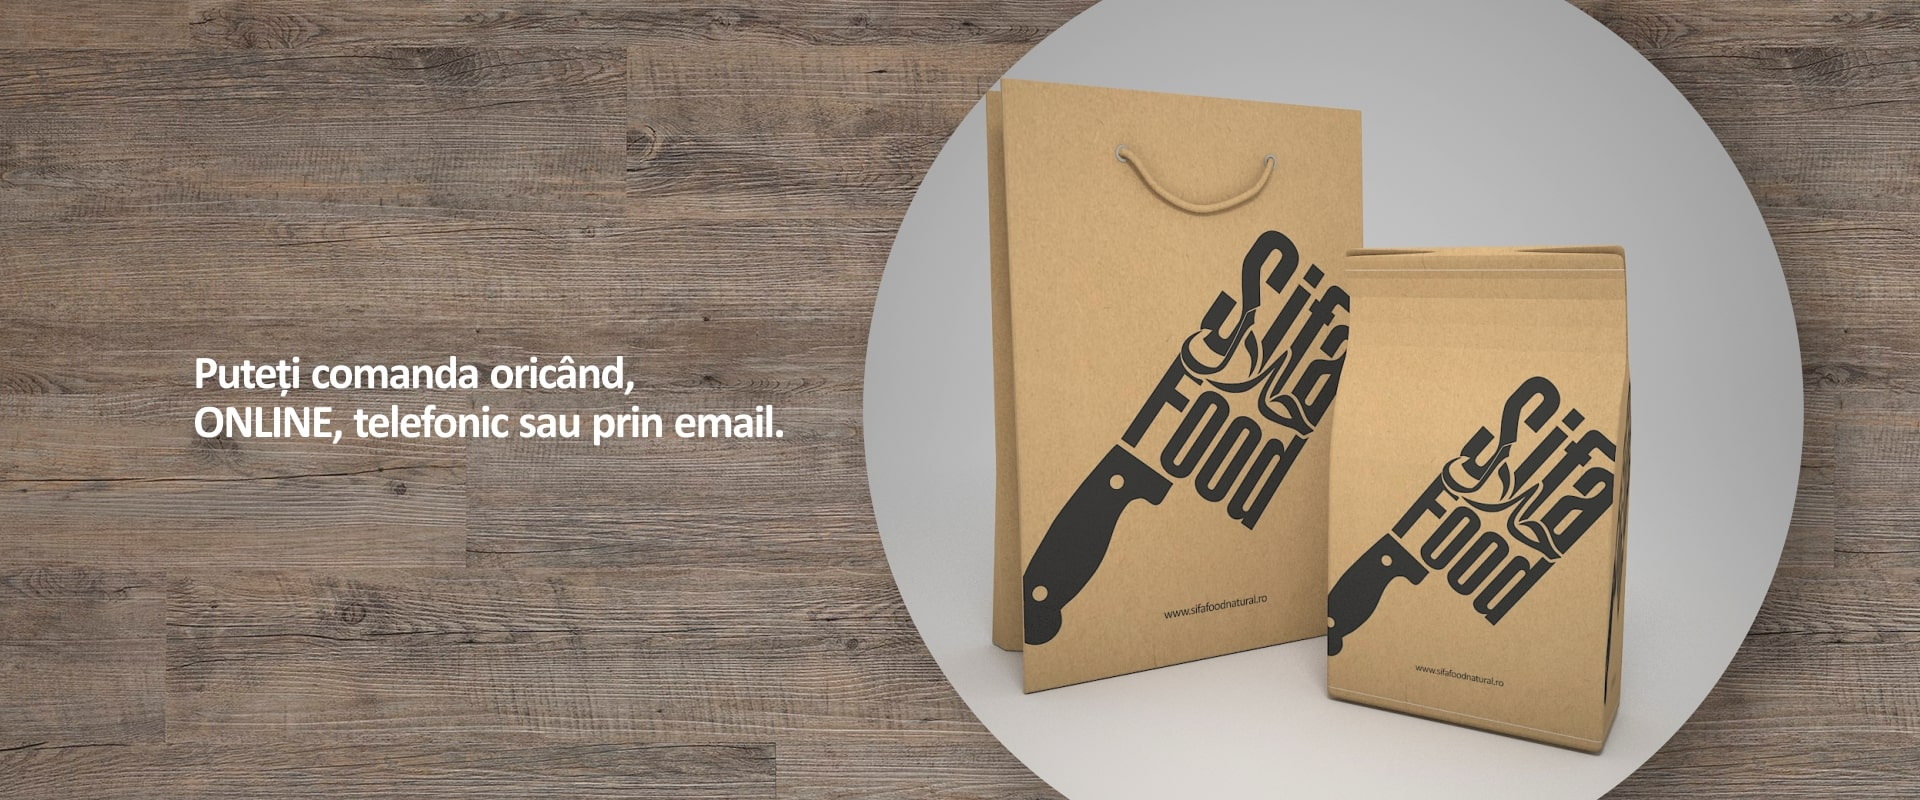 Comanda Online, telefonic sau prin email